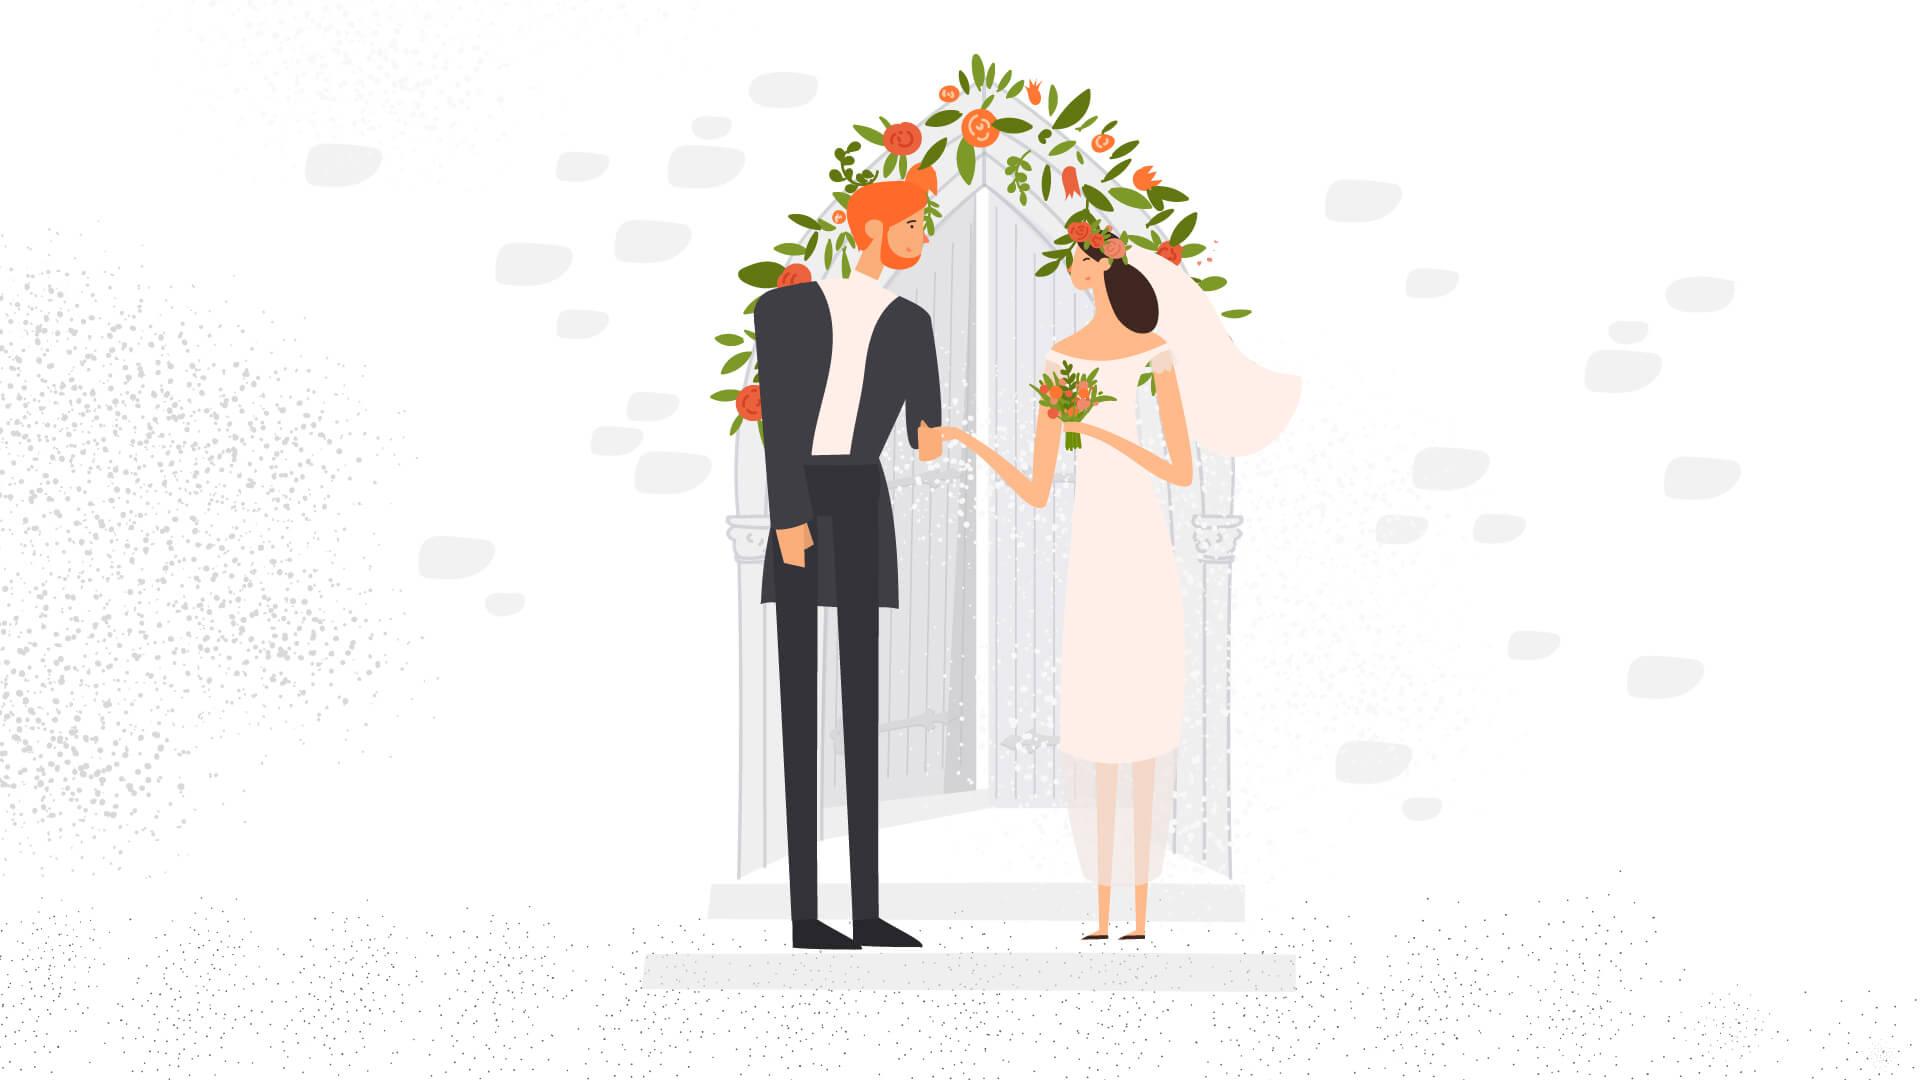 illustration for animated video - GenerPartner